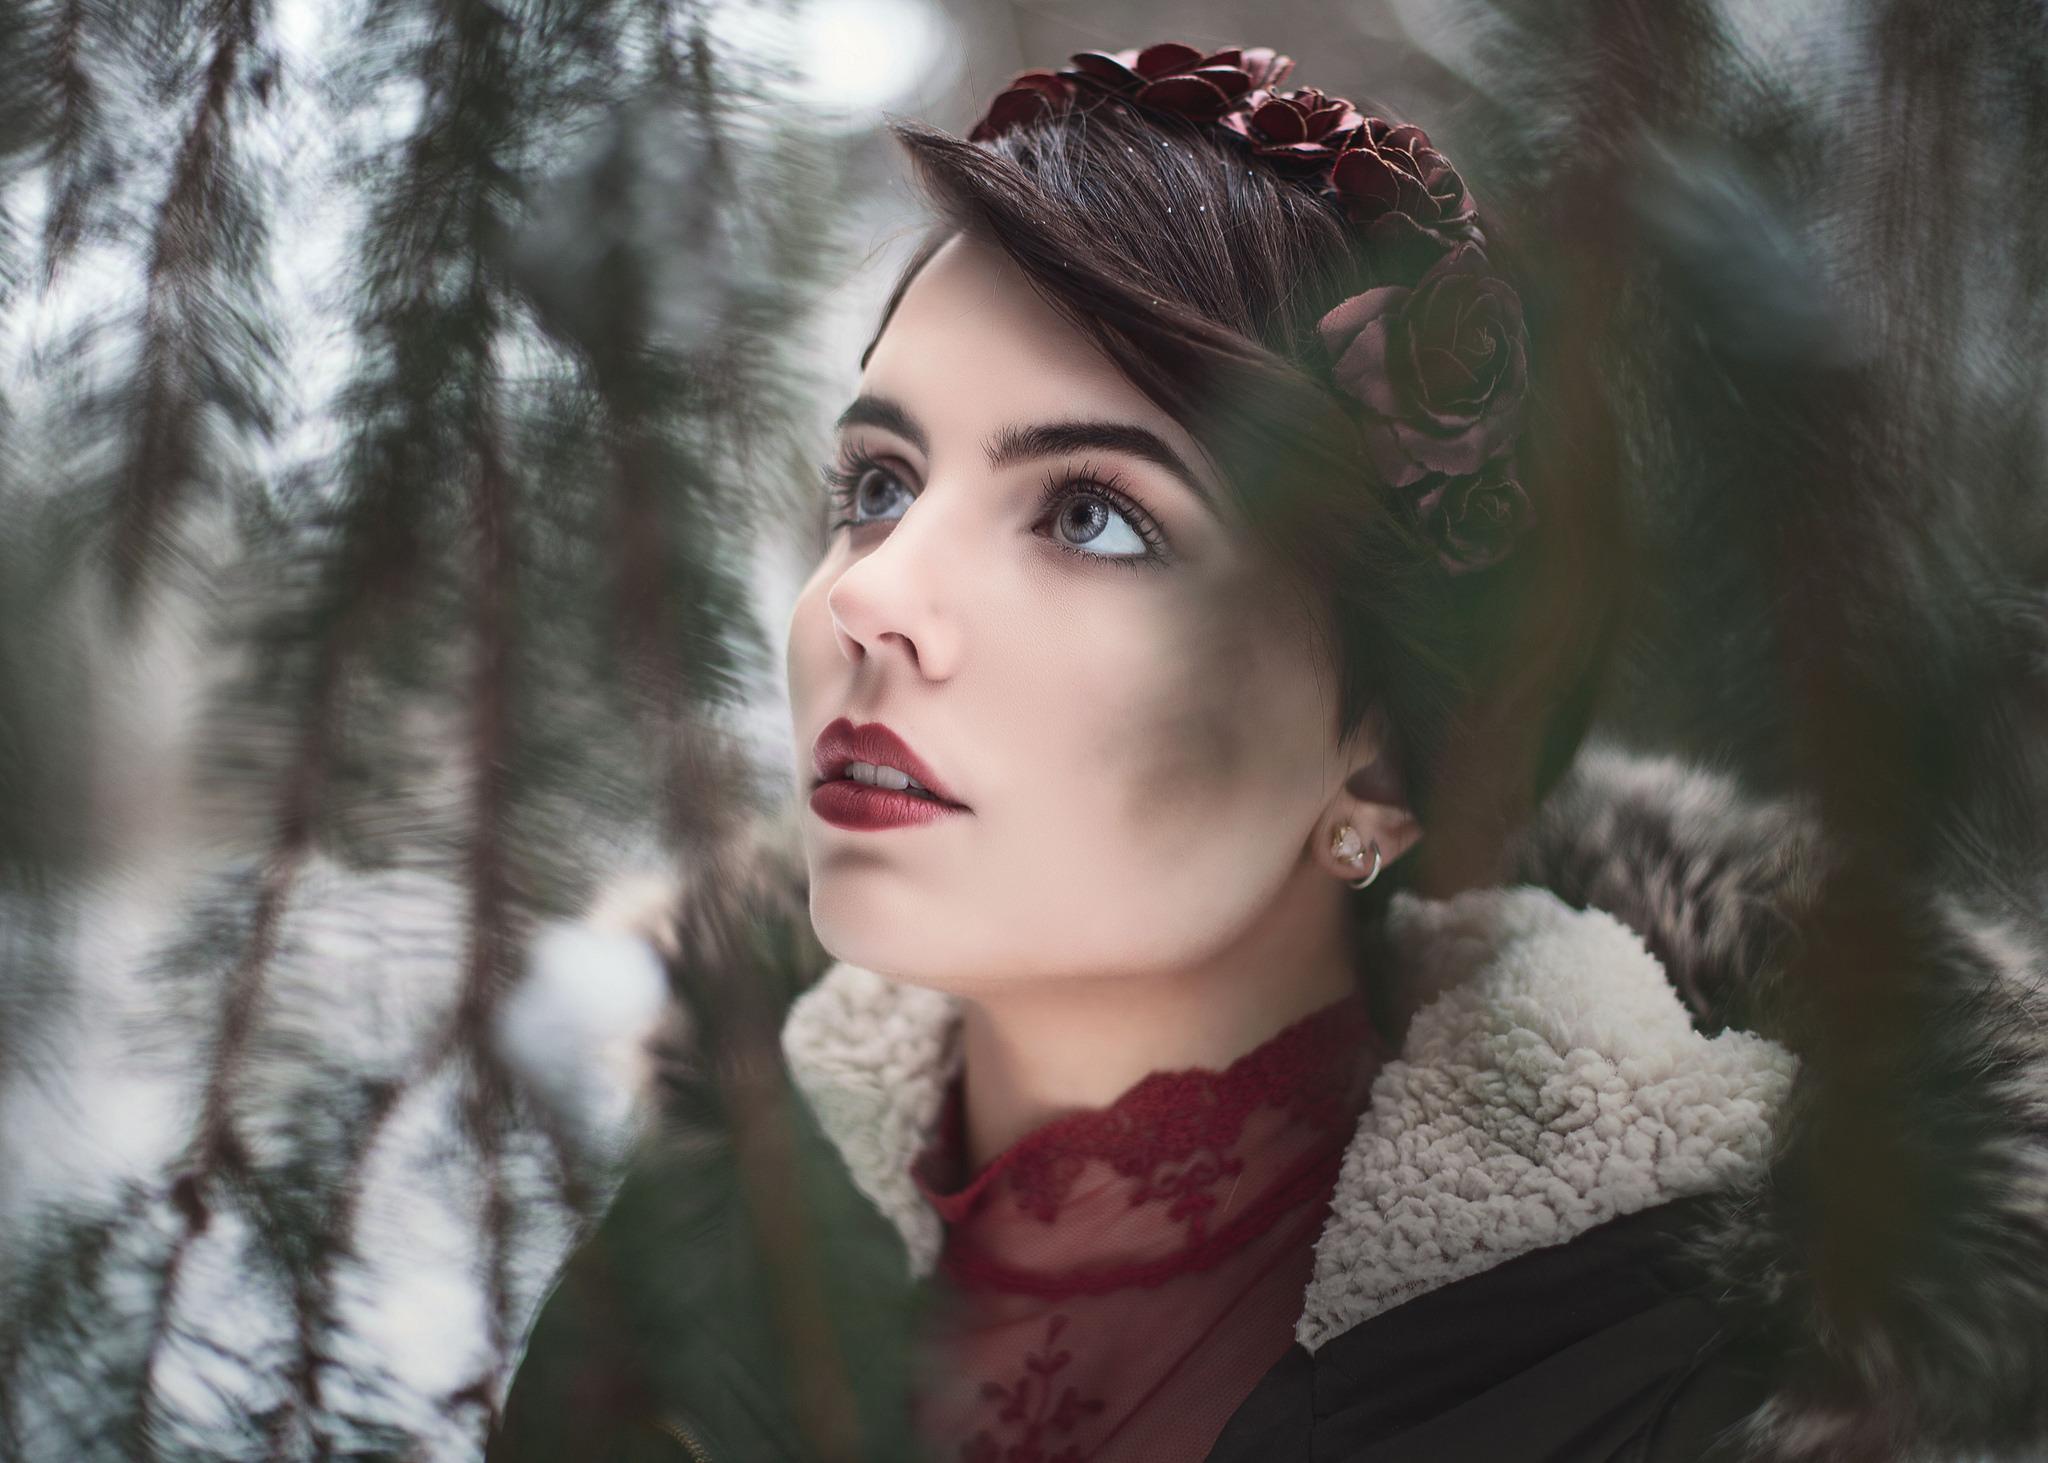 Black Hair Blue Eyes Face Girl Lipstick Model Woman Wreath 2048x1463